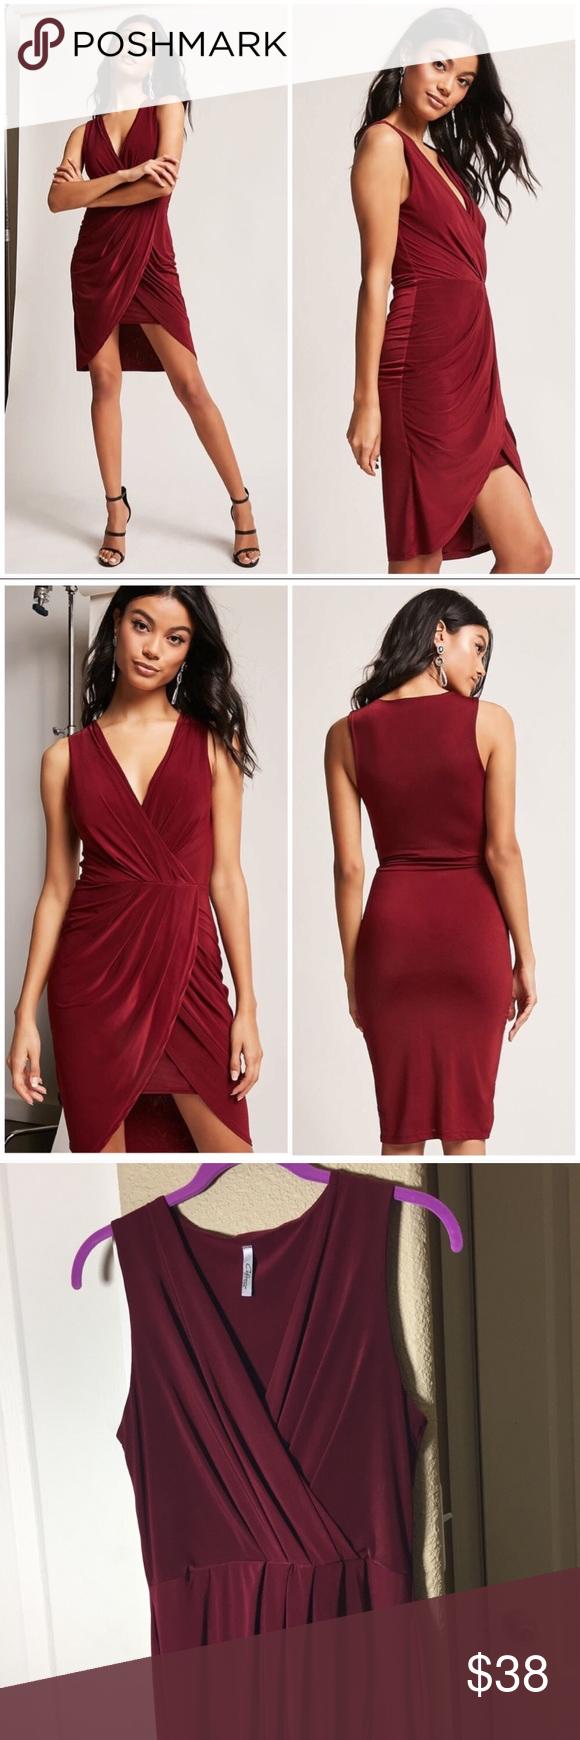 New Forever 21 Wine Wrap Tulip Cocktail Dress M Dresses Stretch Knit Dress Clothes Design [ 1740 x 580 Pixel ]